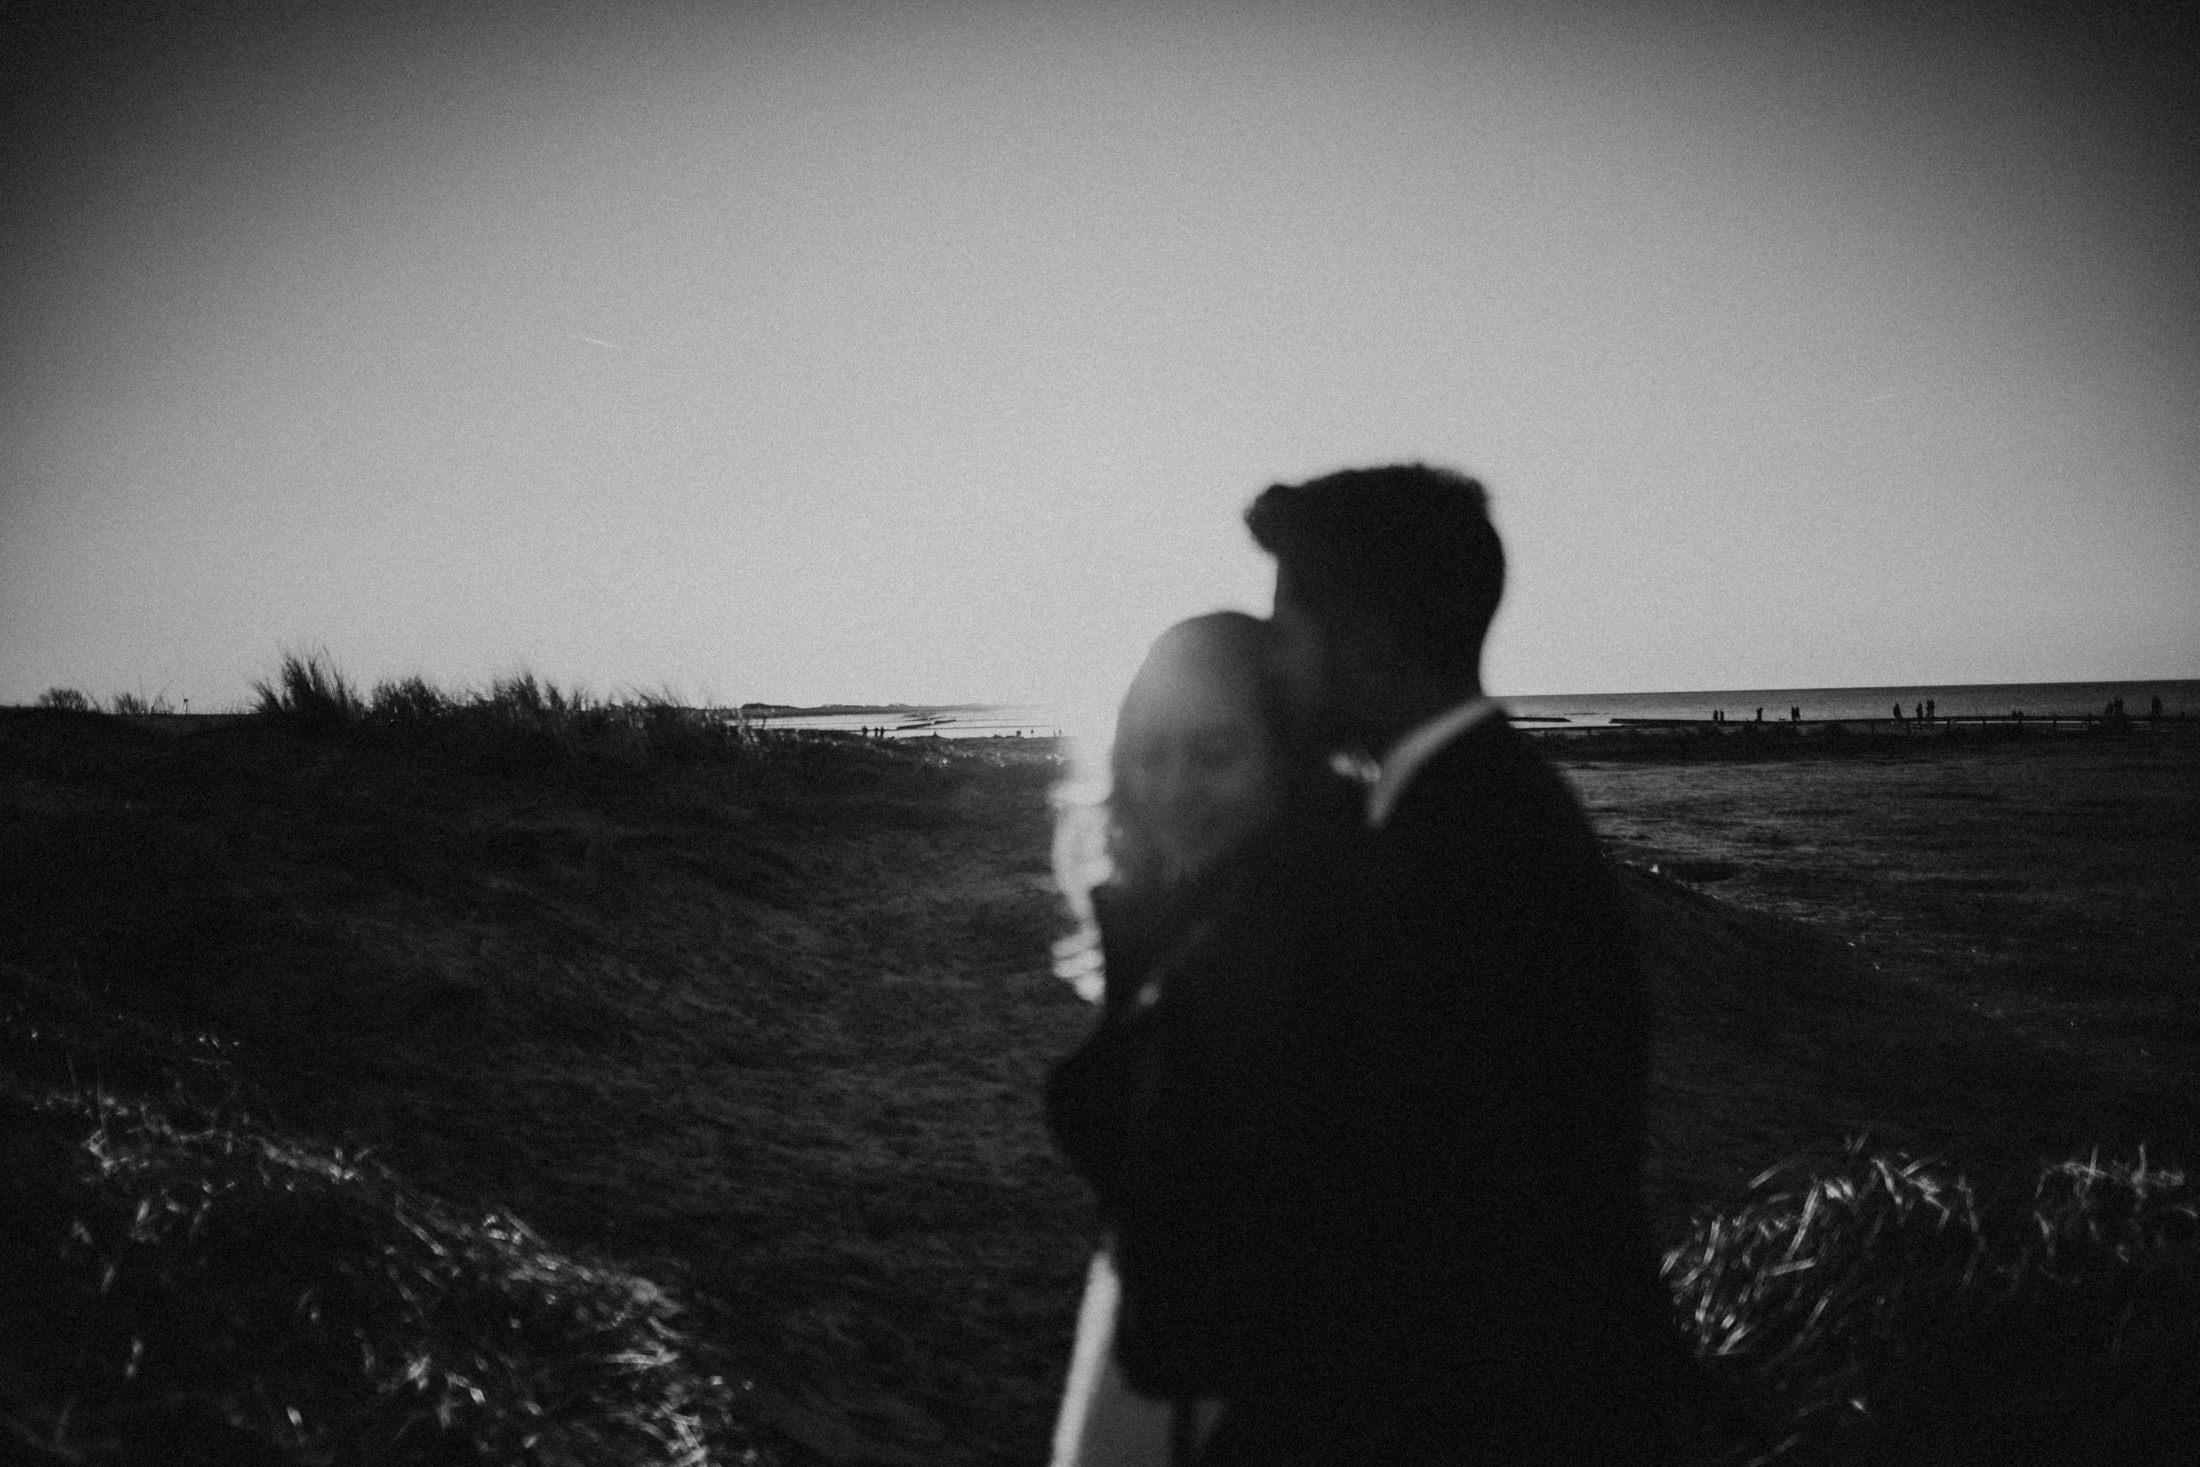 Wedding_Photographer_Mallorca_Daniela-Marquardt_Photography_CanaryIslands_Lanzarote_Iceland_Tuskany_Santorini_Portugal_Schweiz_Austria_Bayern_Elopement_Hochzeitsfotograf_Norddeichich_28